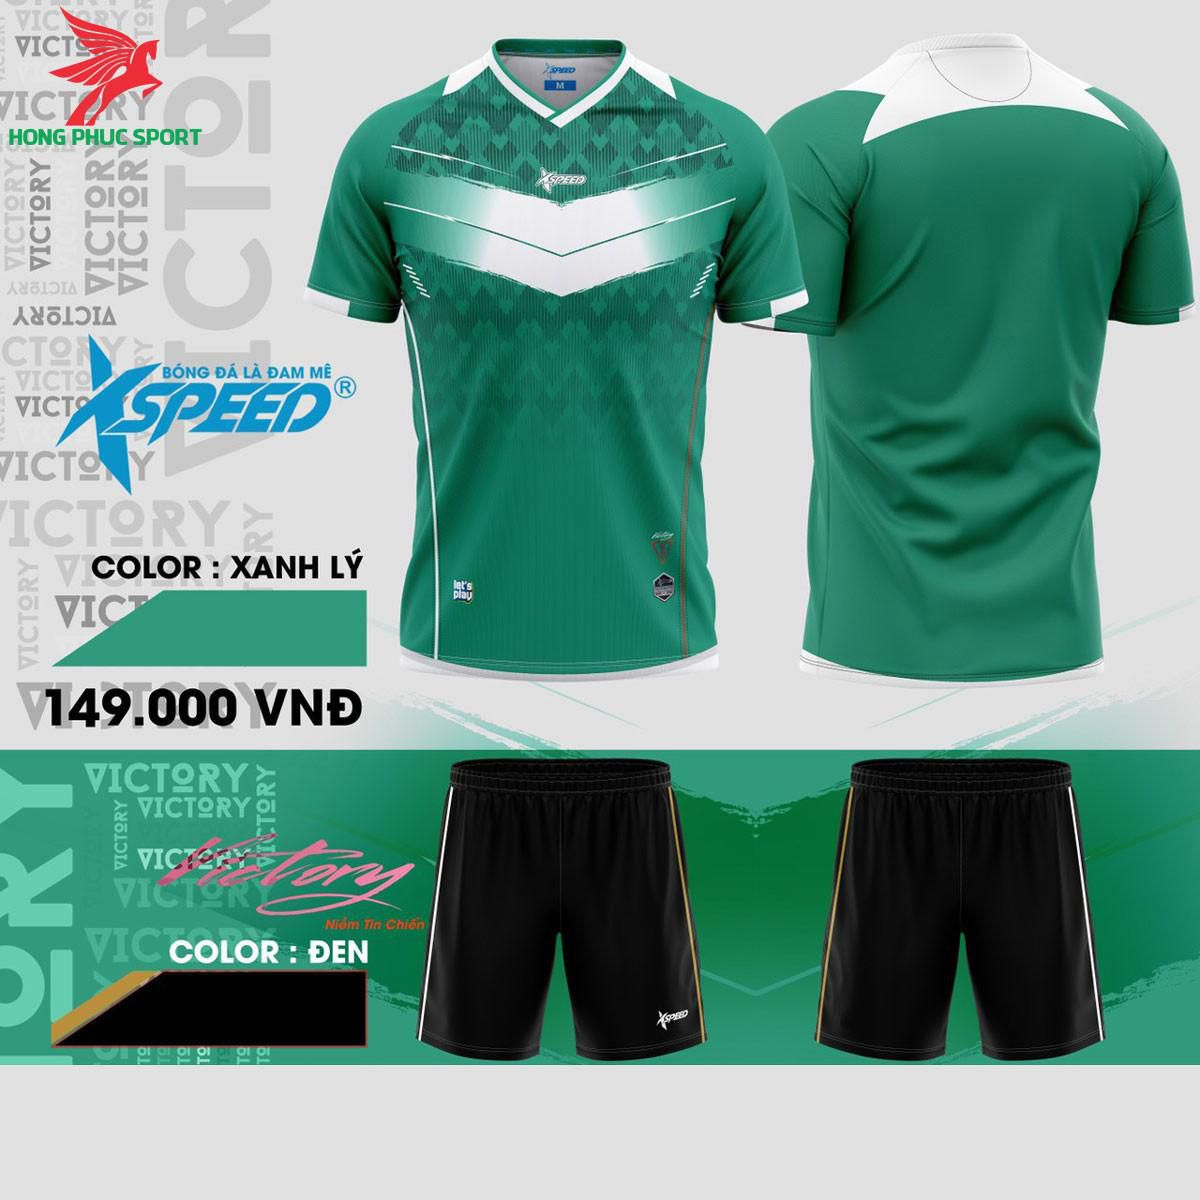 https://cdn.hongphucsport.com/unsafe/s4.shopbay.vn/files/285/ao-khong-logo-xspeed-victory-mau-xanh-la-605170a26a77c.jpg